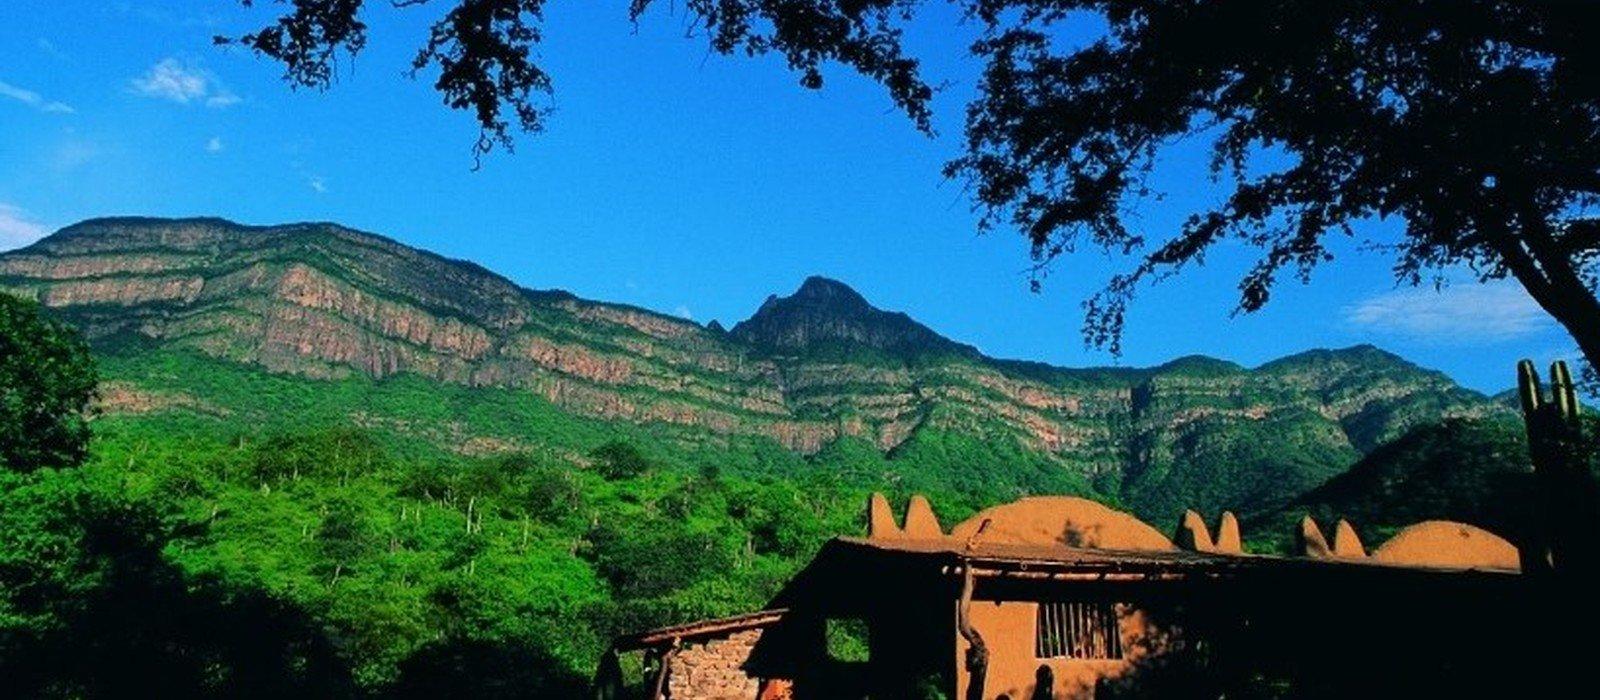 Chaparri Ecological Reserve